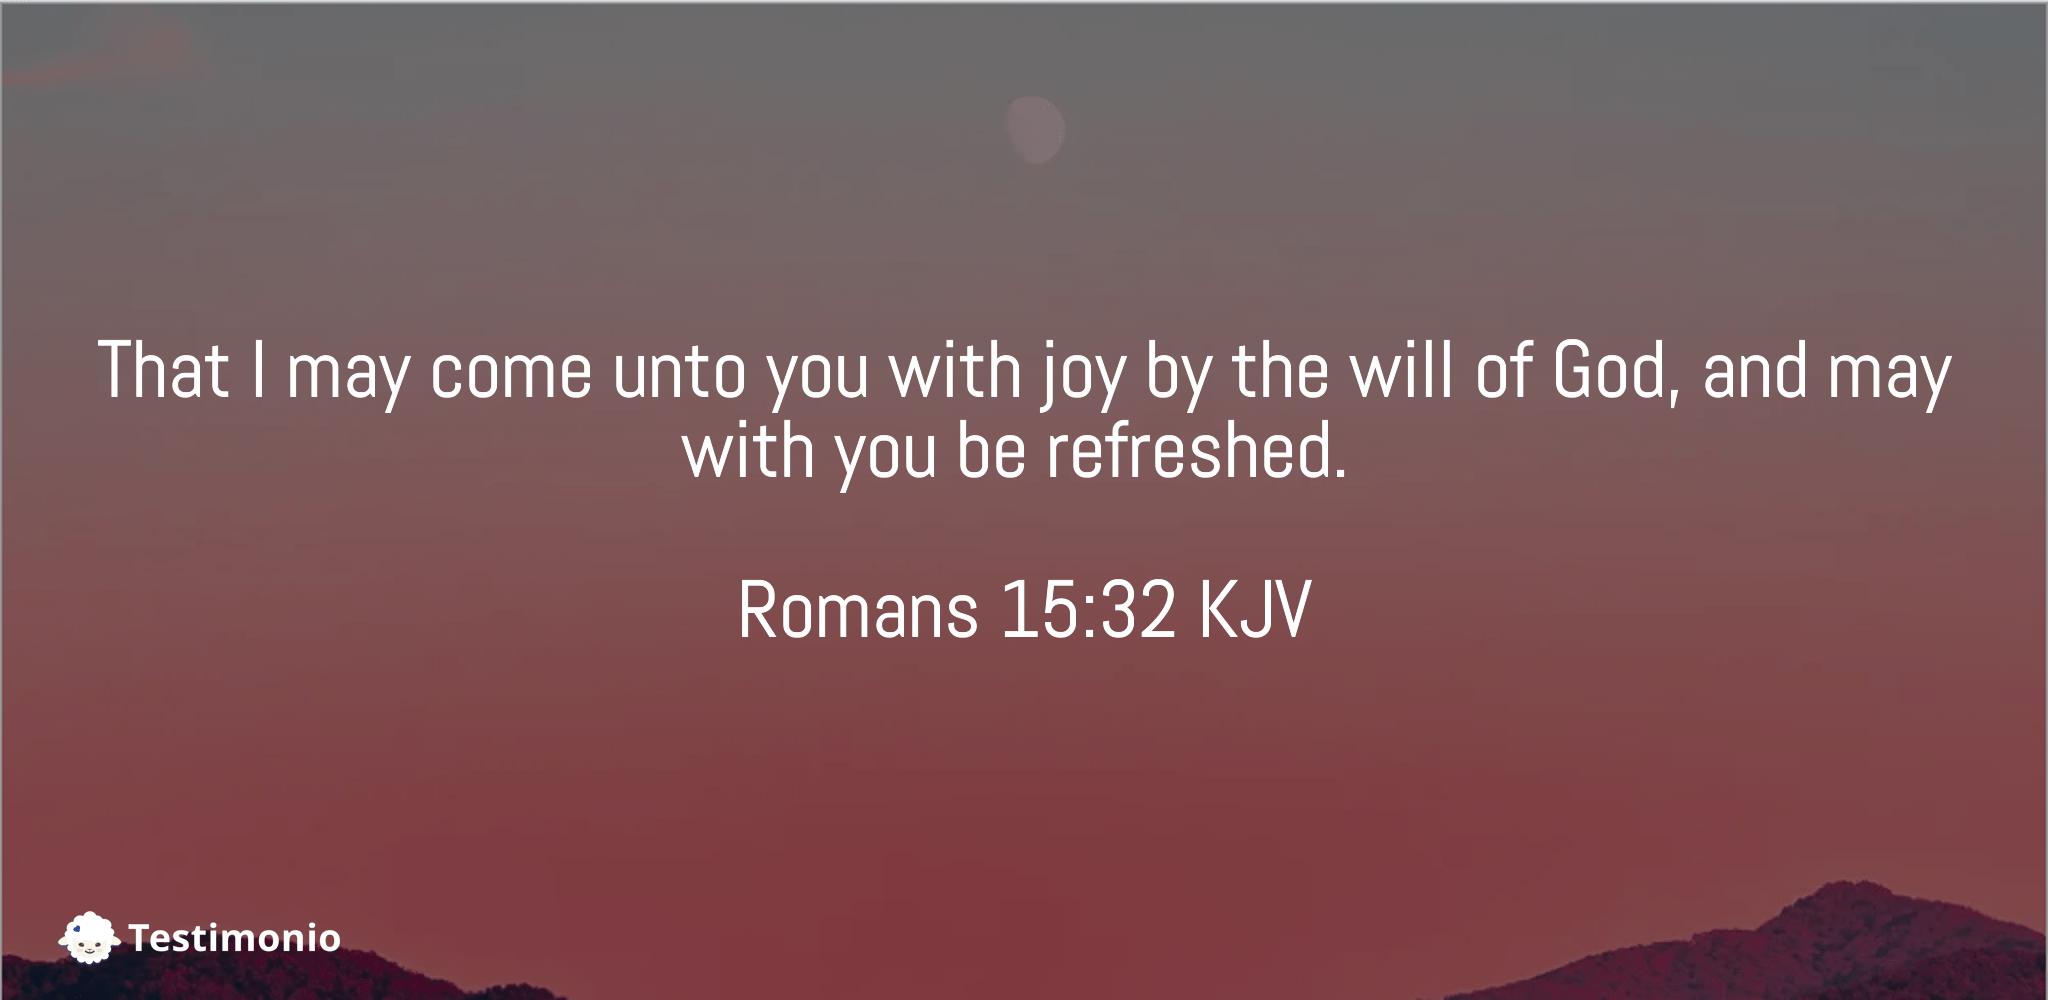 Romans 15:32